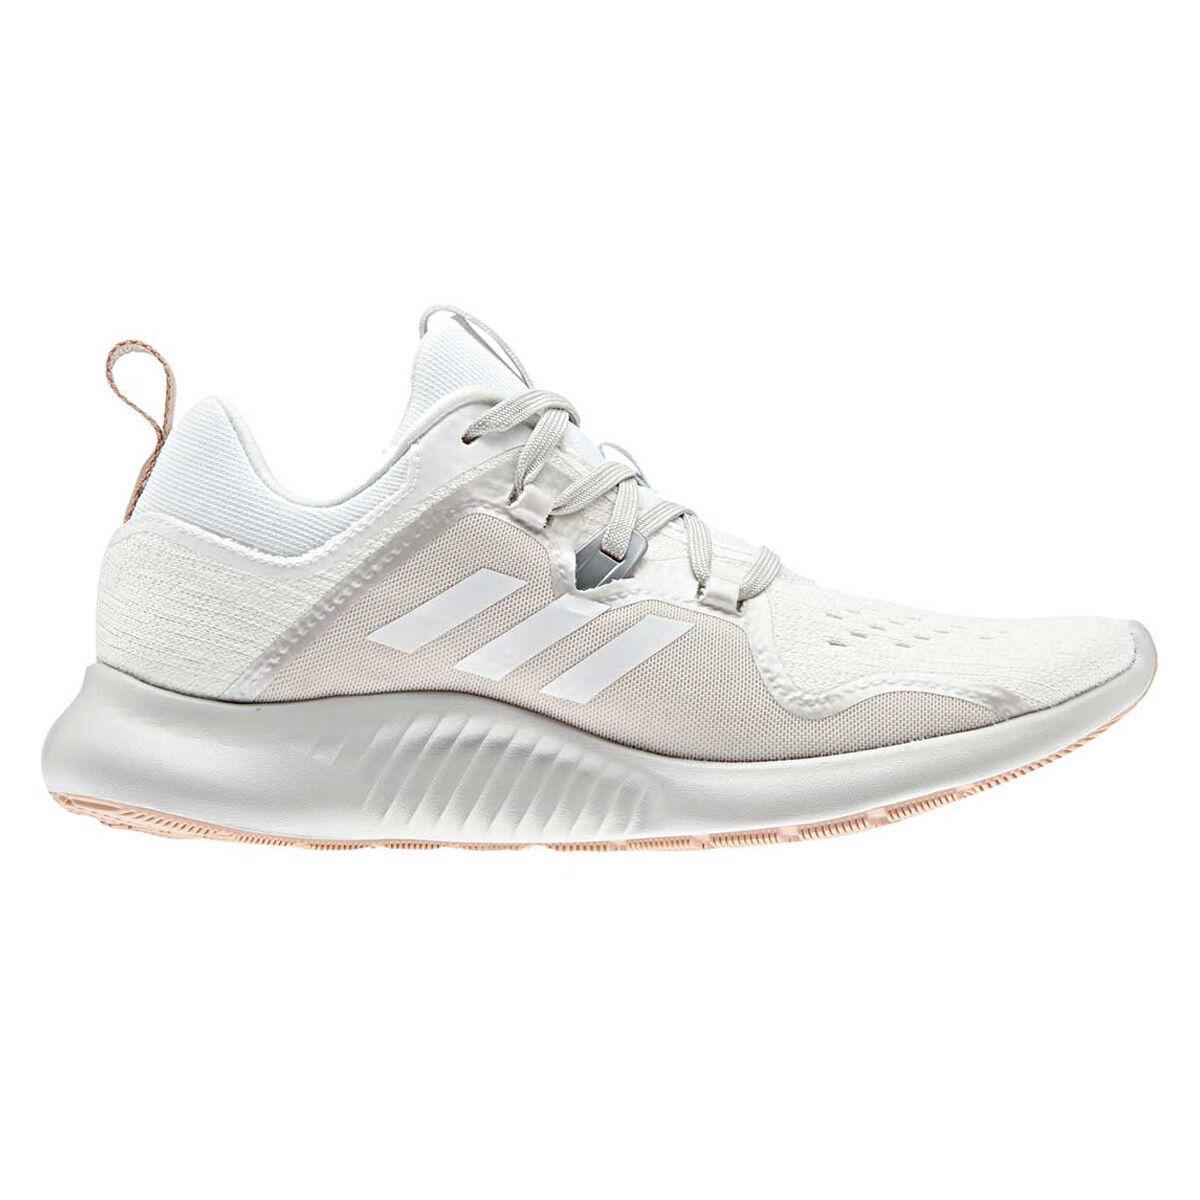 adidas Edgebounce Womens Running Shoes